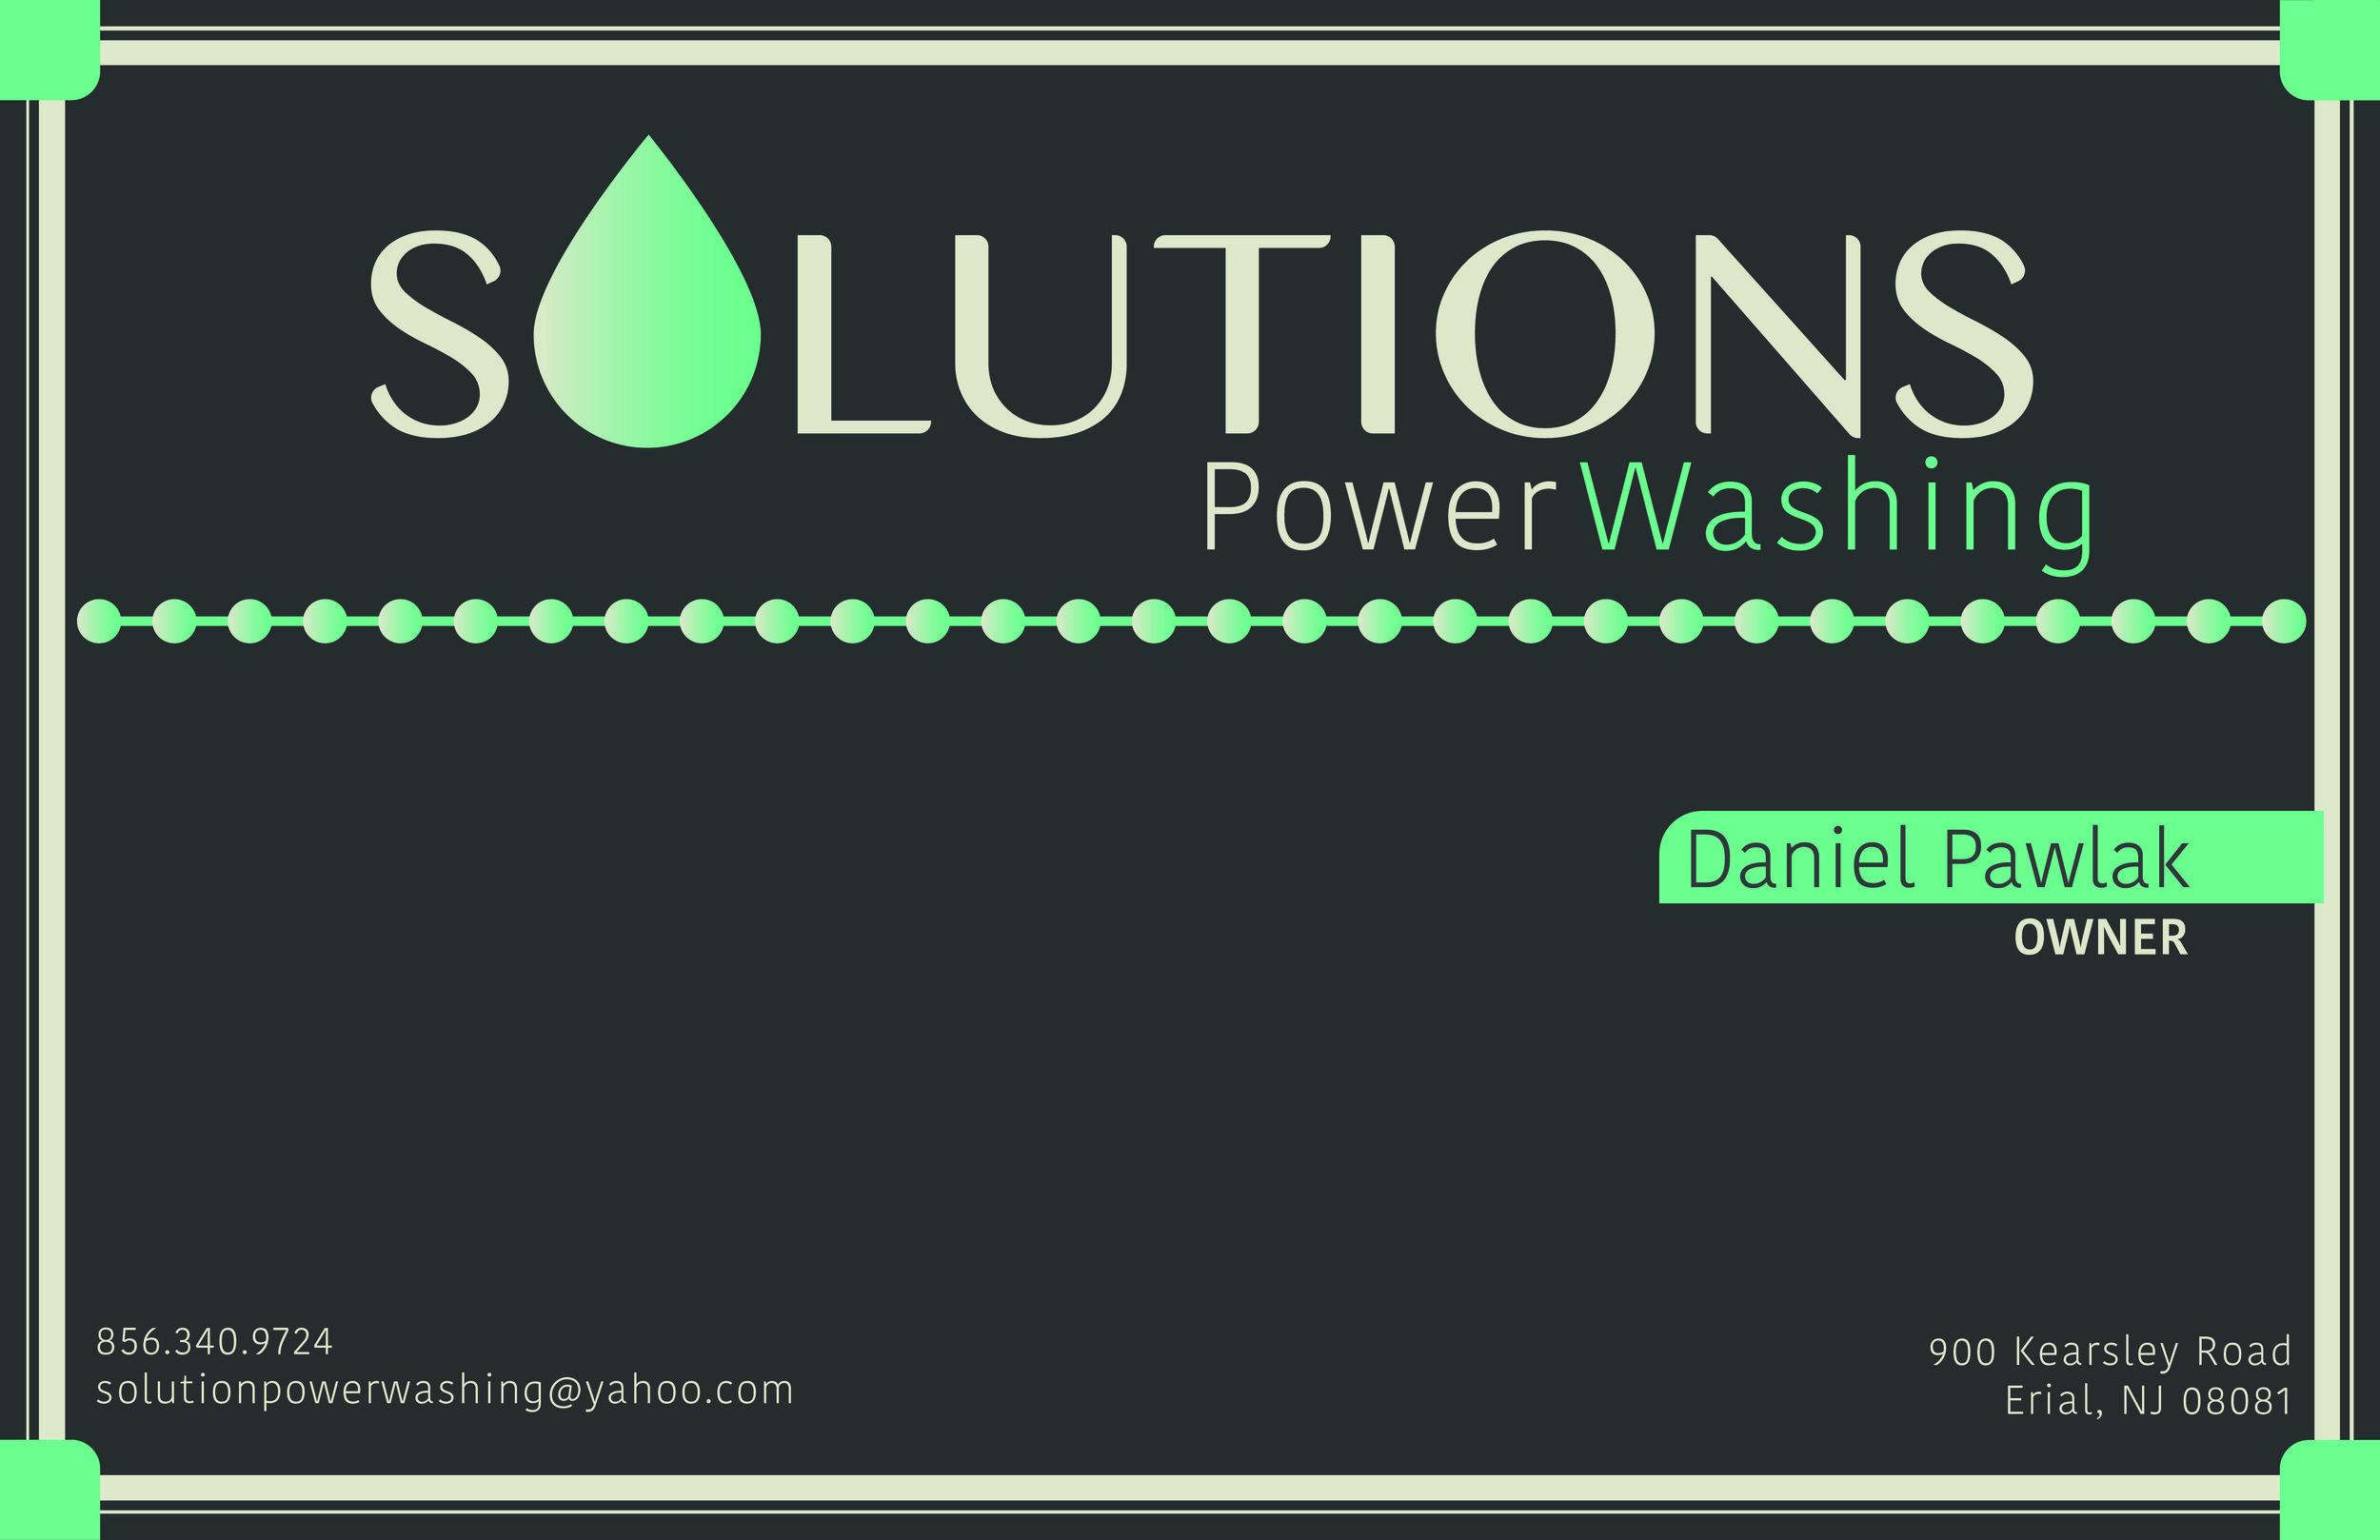 SOLUTIONS POWERWASHING05.jpg